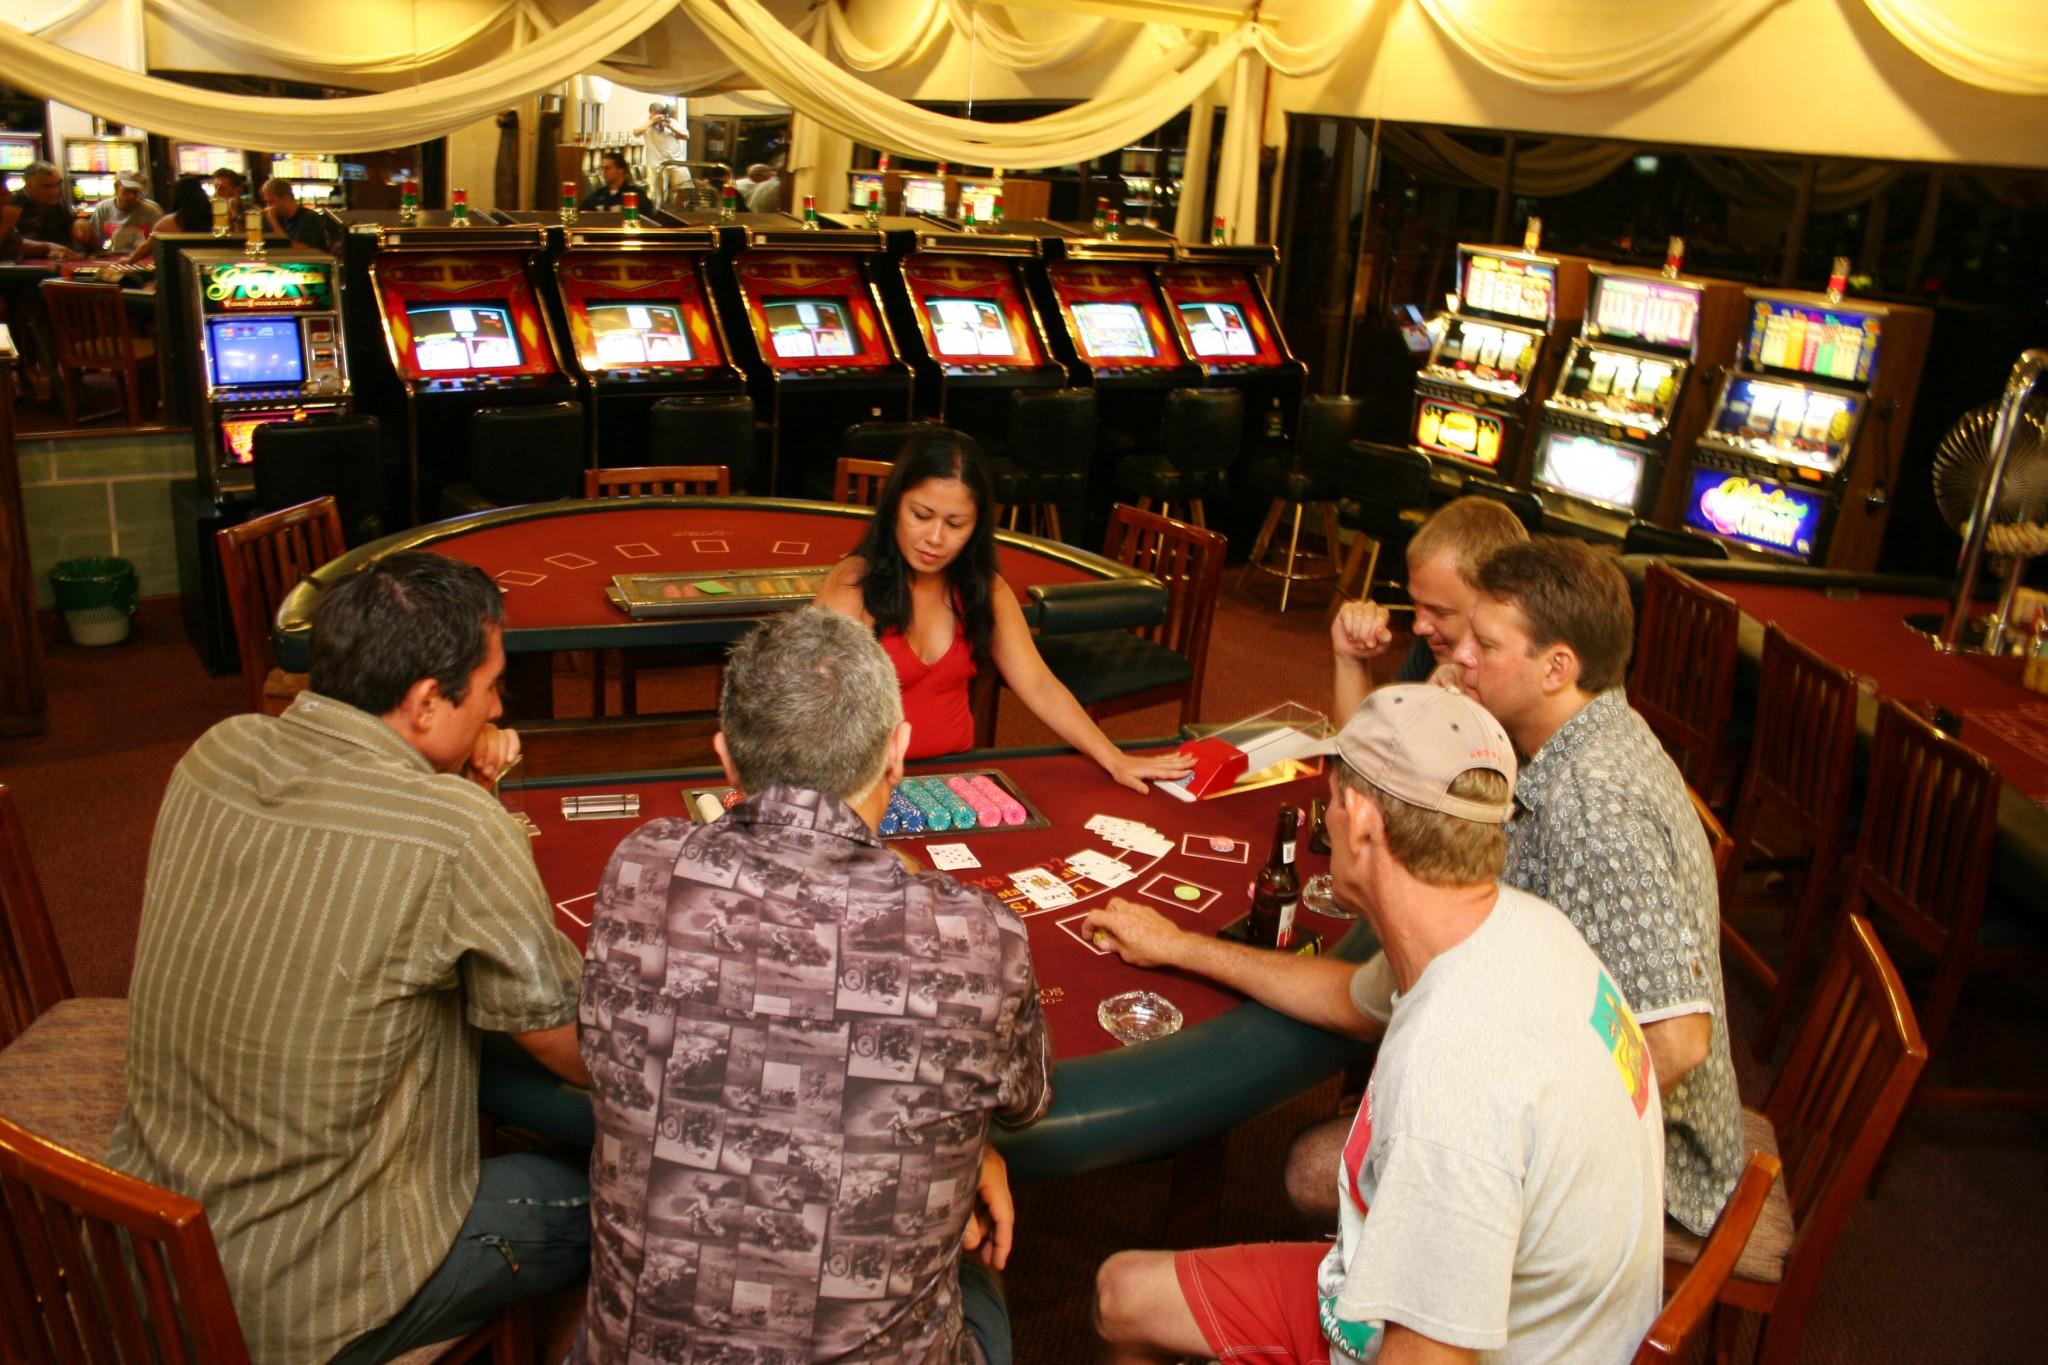 Byblos casino casino game holdem online poker poker texas yourbestonlinecasino.com